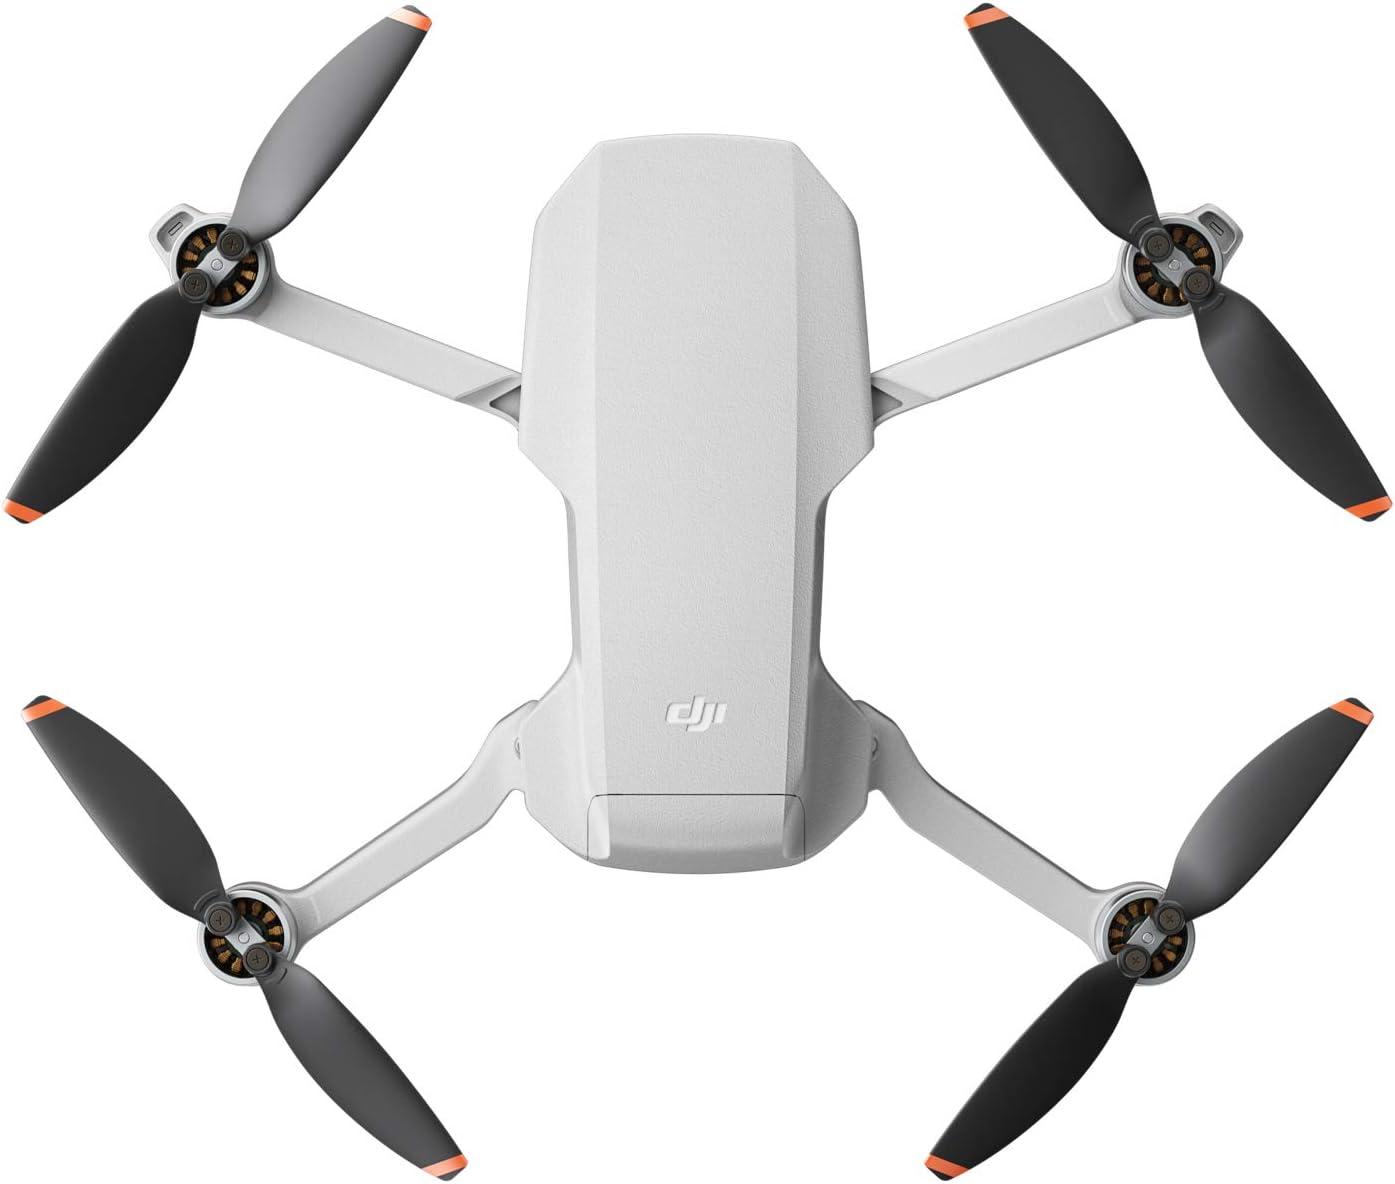 DJI Mini 2 Quadcopter with 4K Camera